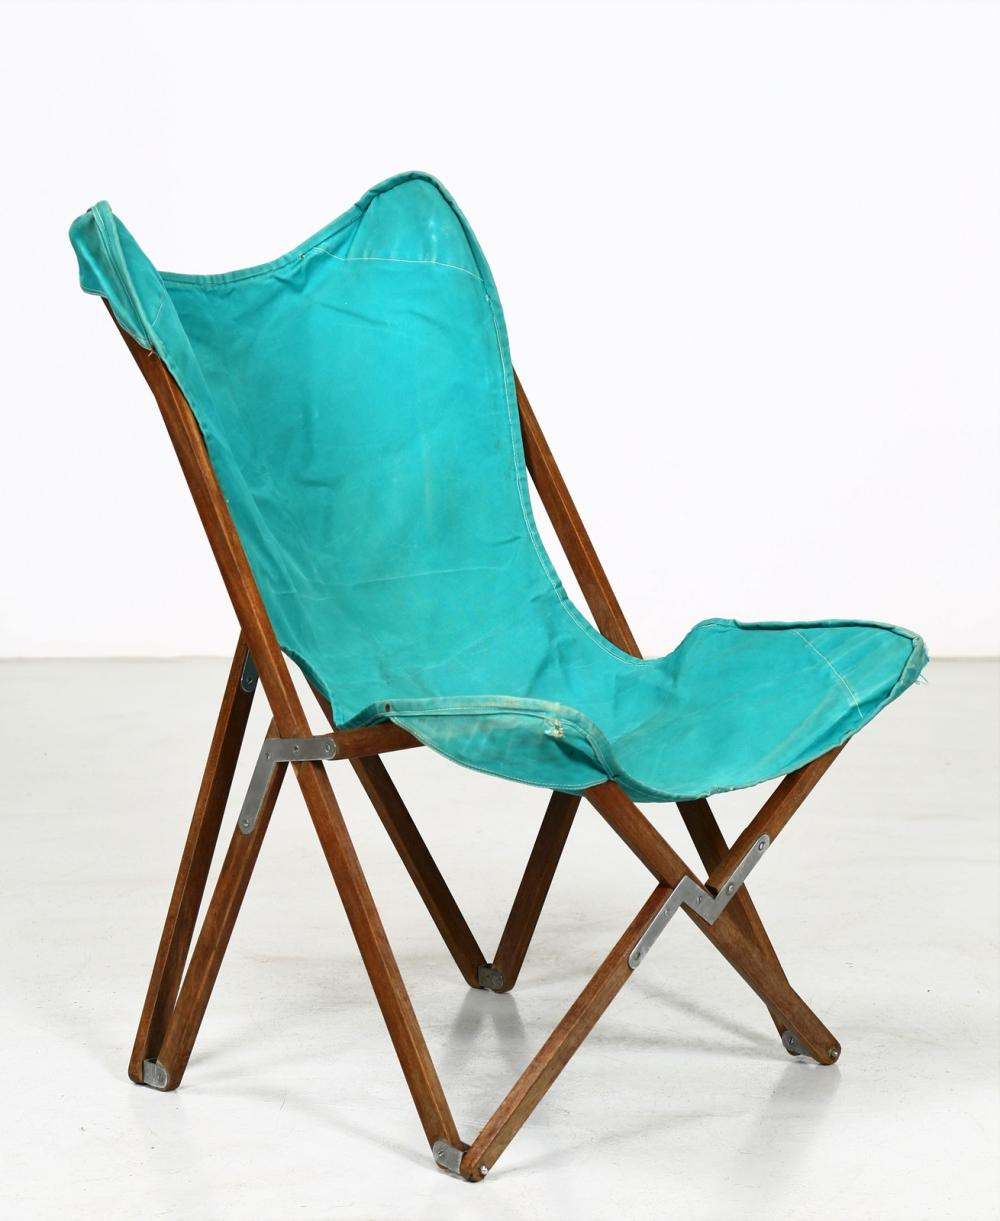 ITALIAN MANUFACTURE Chair mod. Tripolina